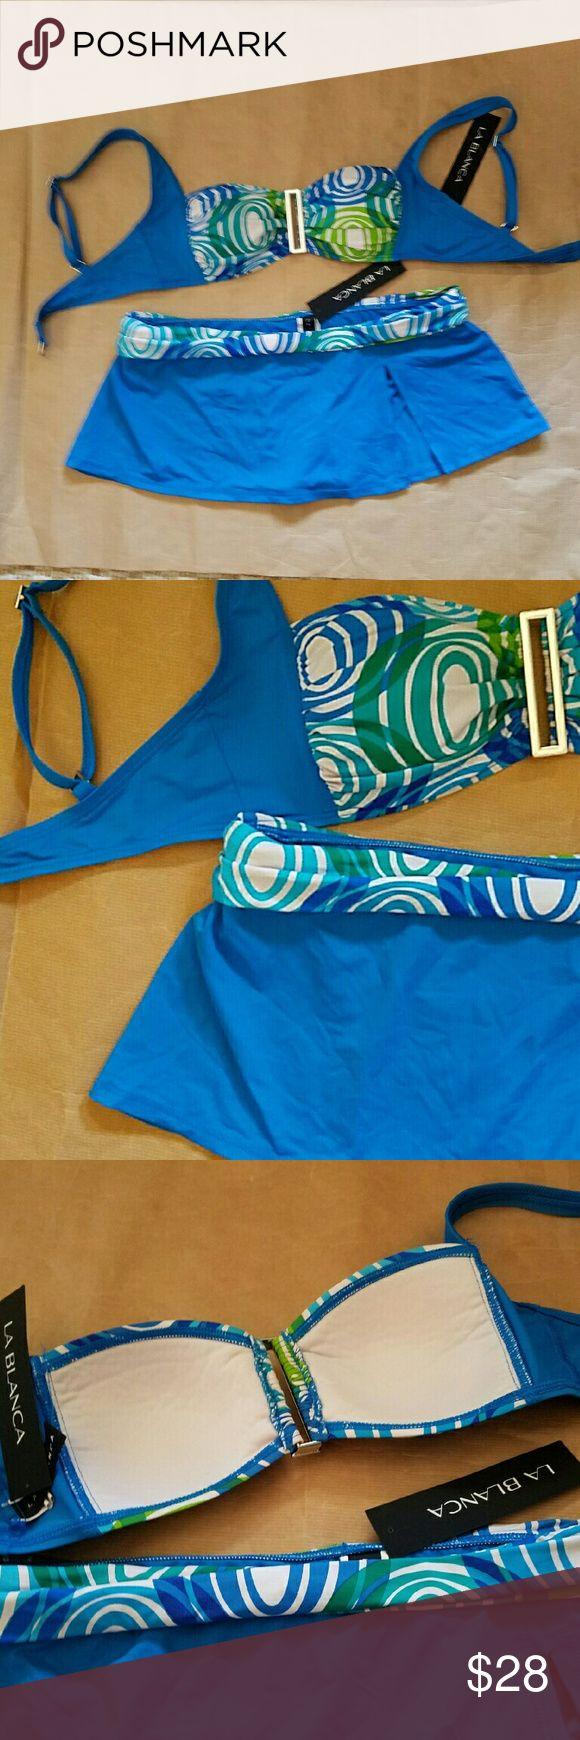 LA BLANCA SIZE 8 SWIMSUIT LA BLANCA SKIRT SWIMSUIT SIZE 8 BLUE WHITE La Blanca Swim Bikinis